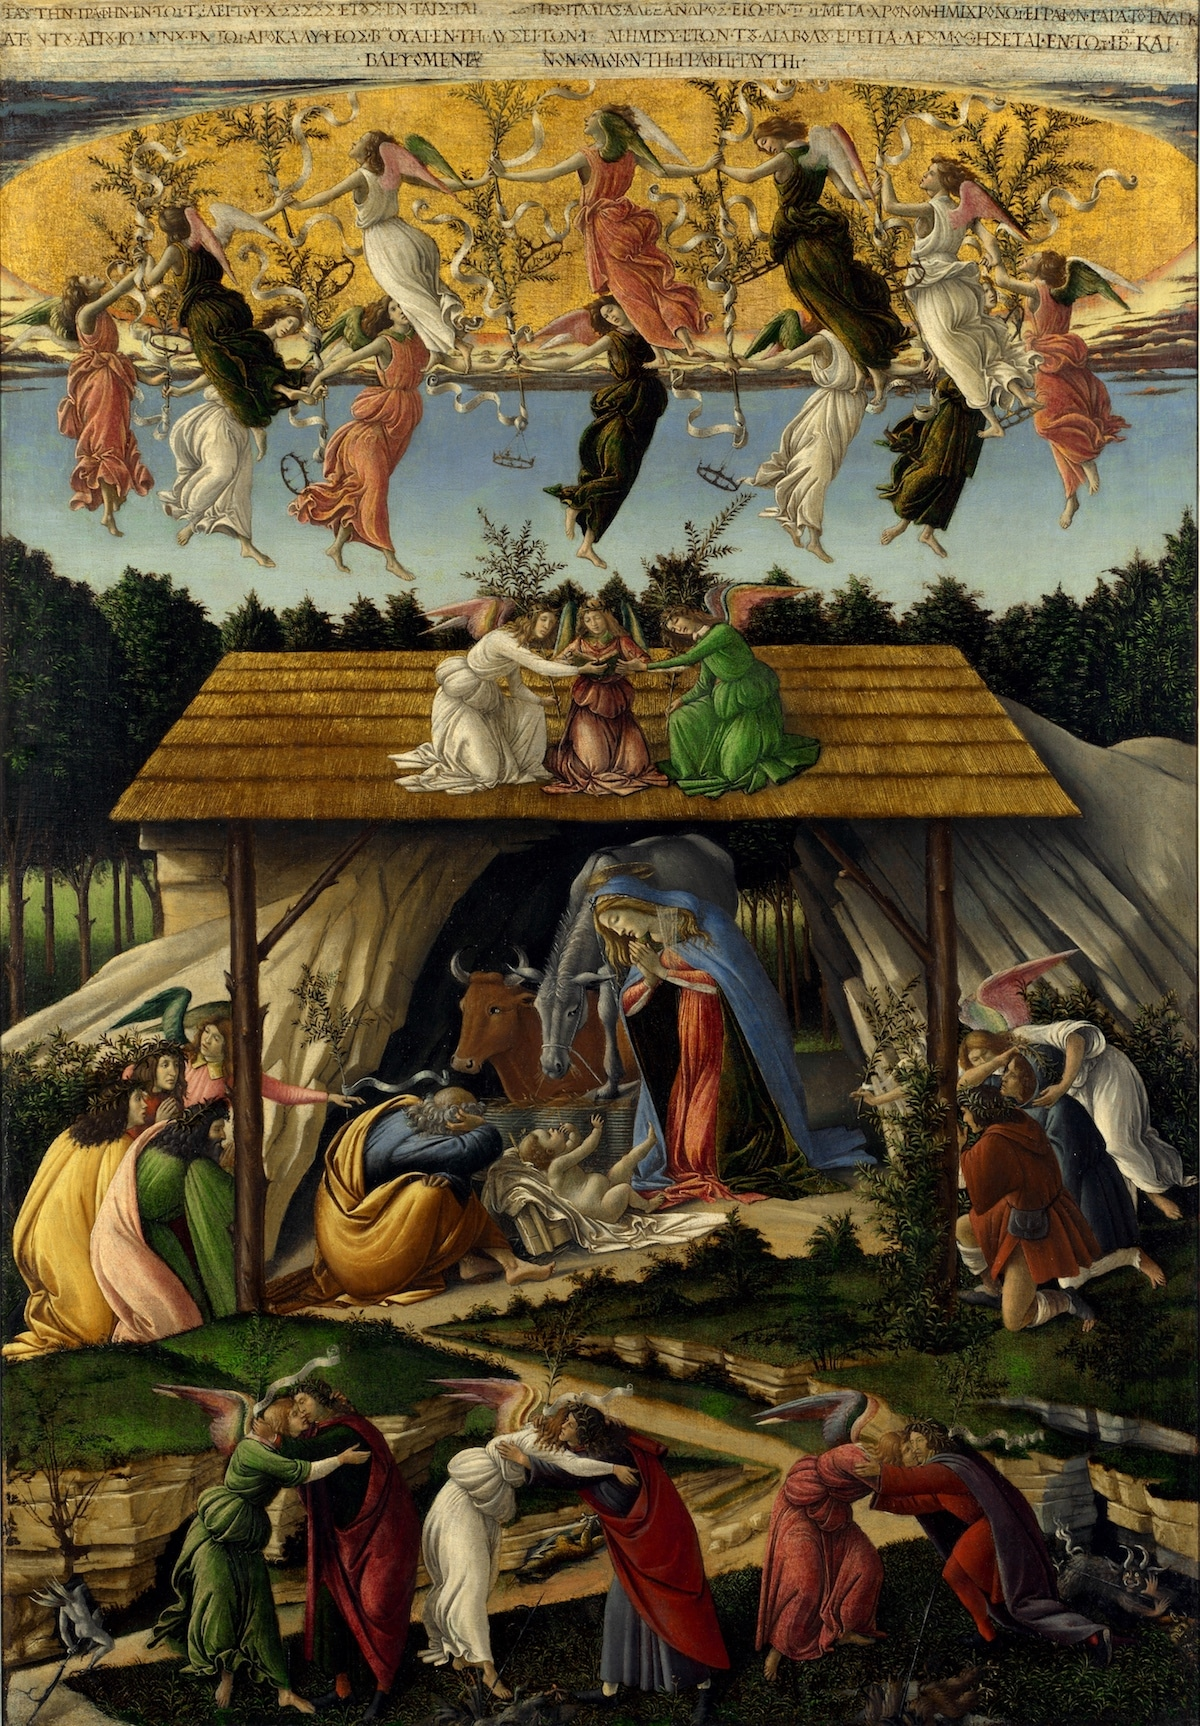 Mystical Nativity Painting by Sandro Botticelli